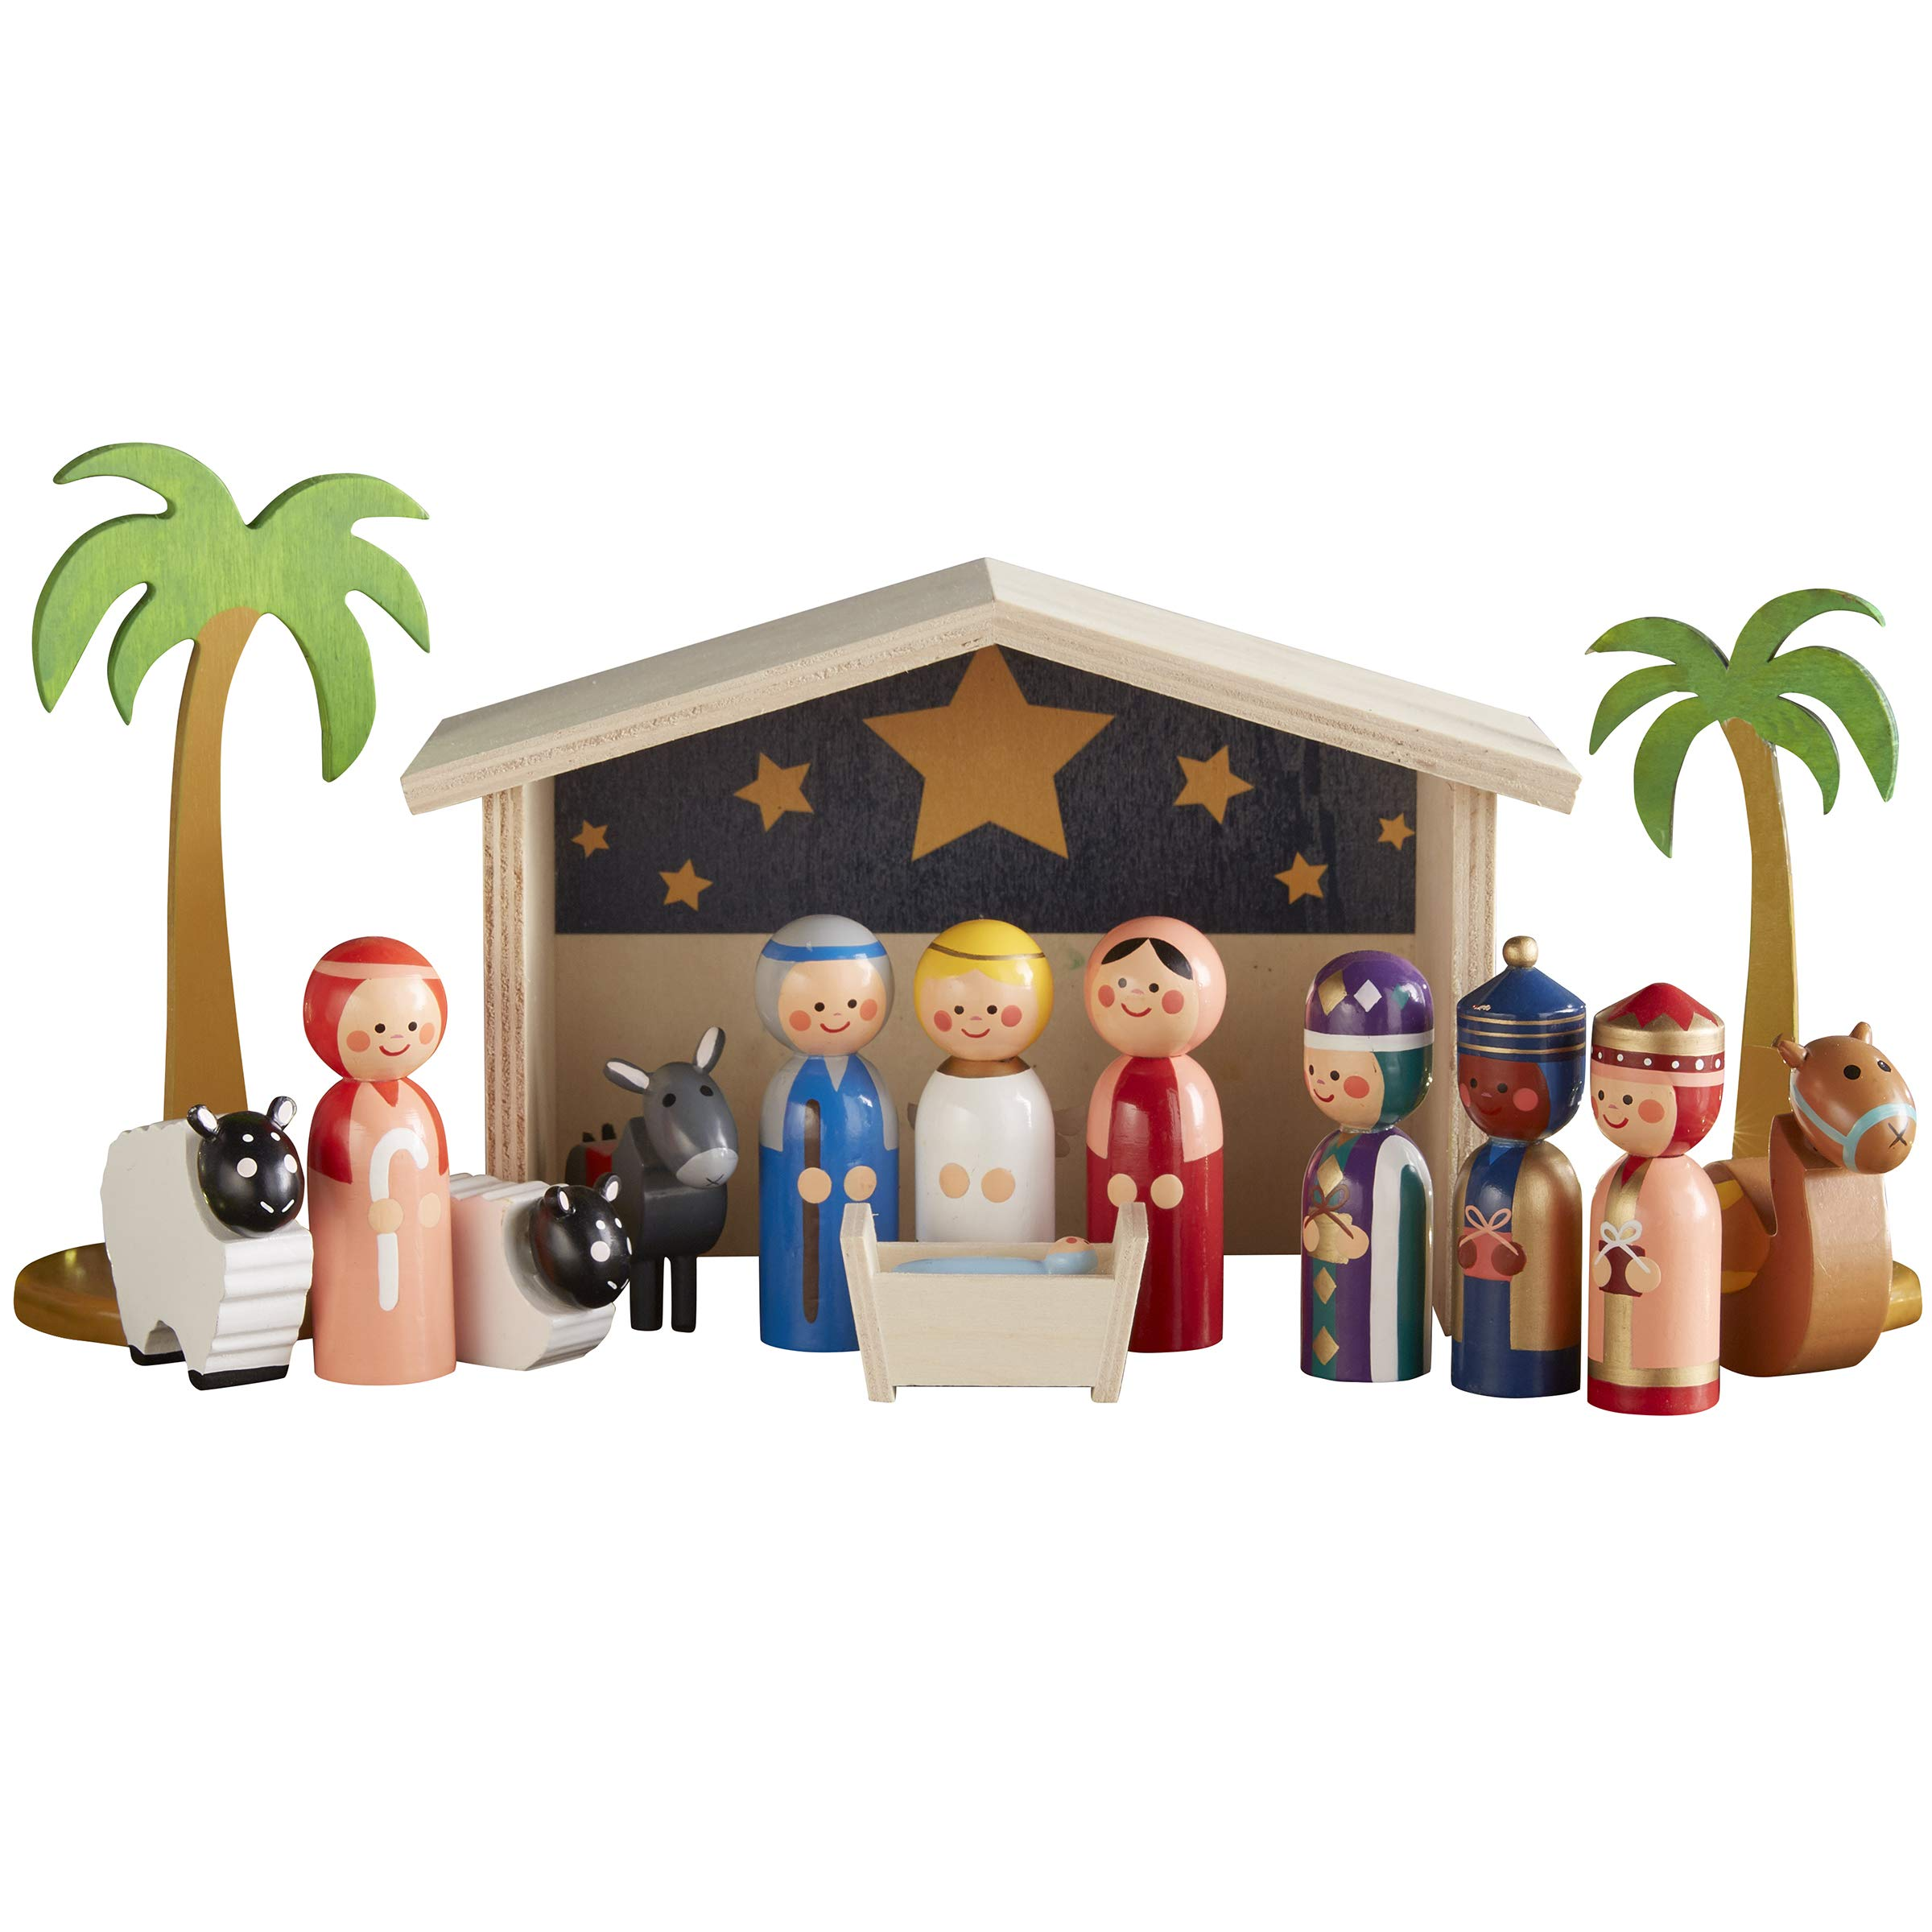 FAO Schwarz Holiday Nativity Set Wood 15pc